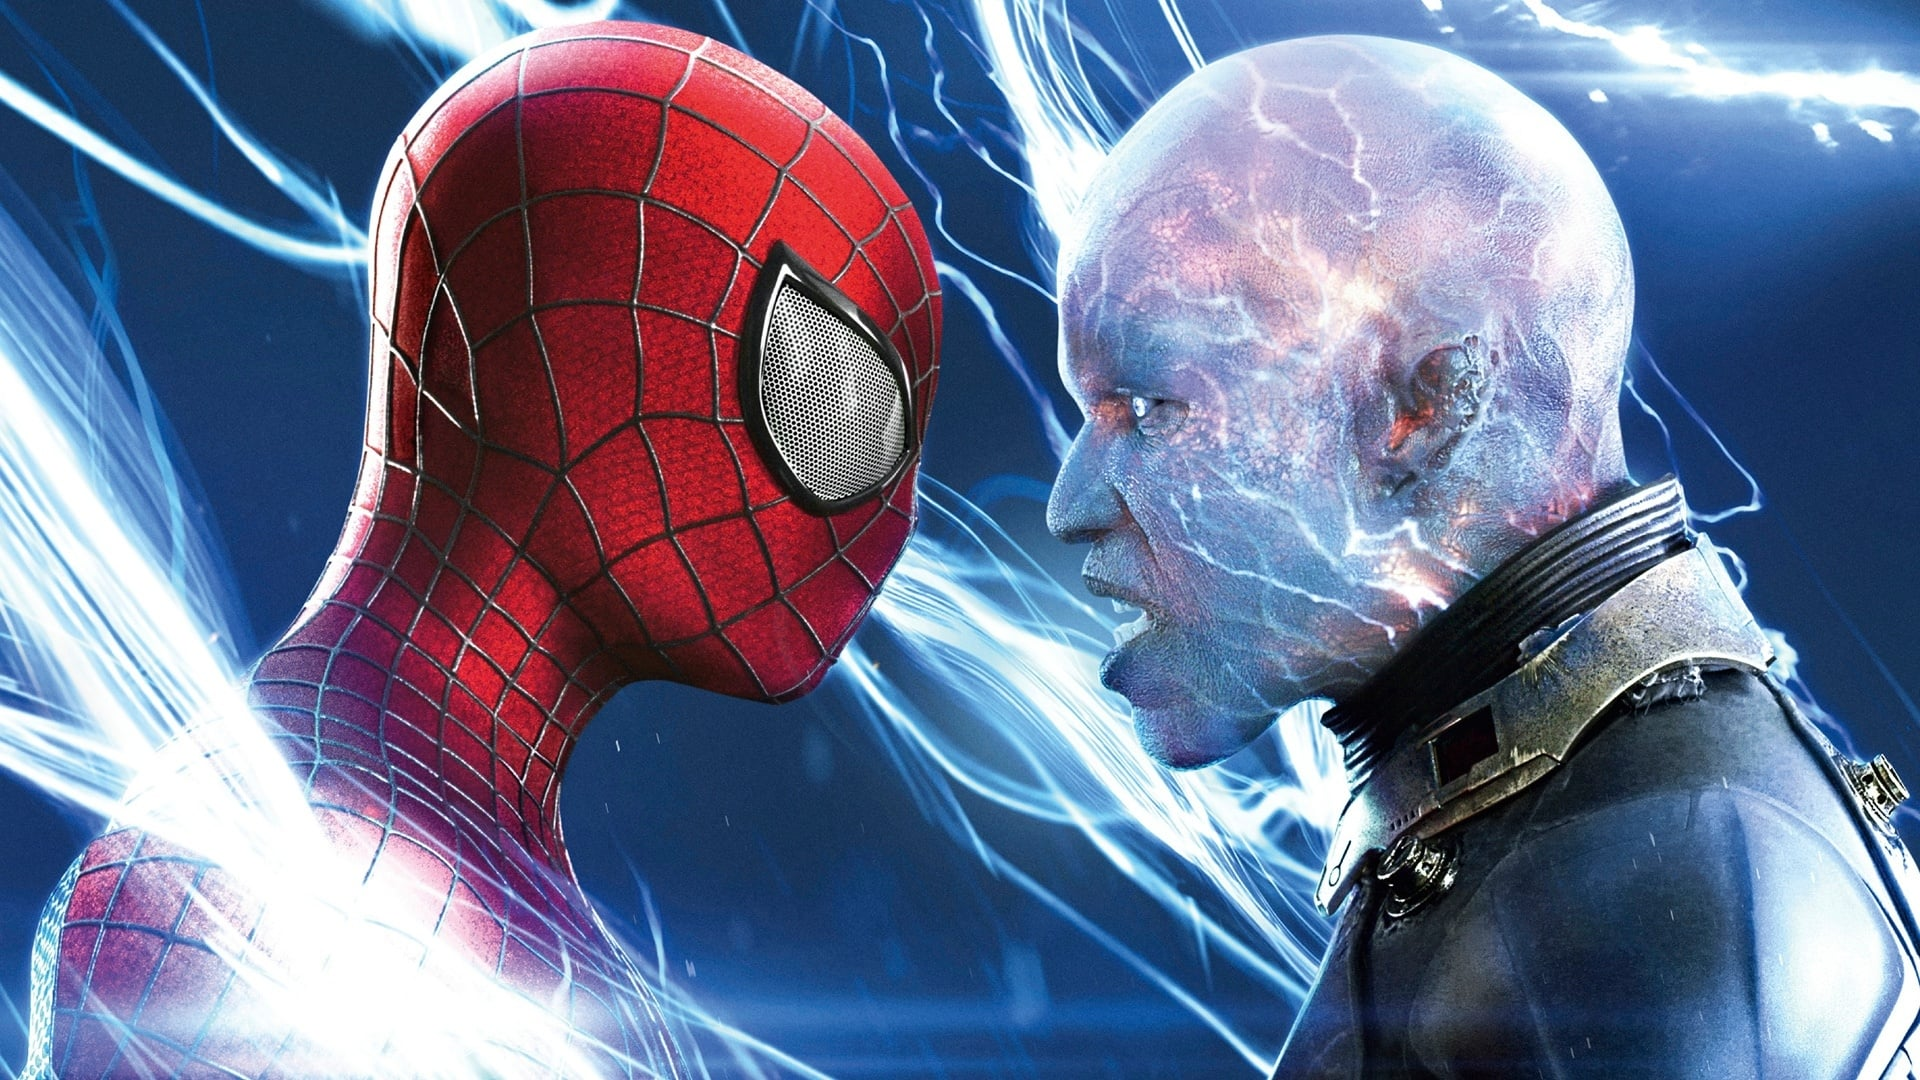 The Amazing Spider Man 2 2014 Watch Full Movie Openloadmovies